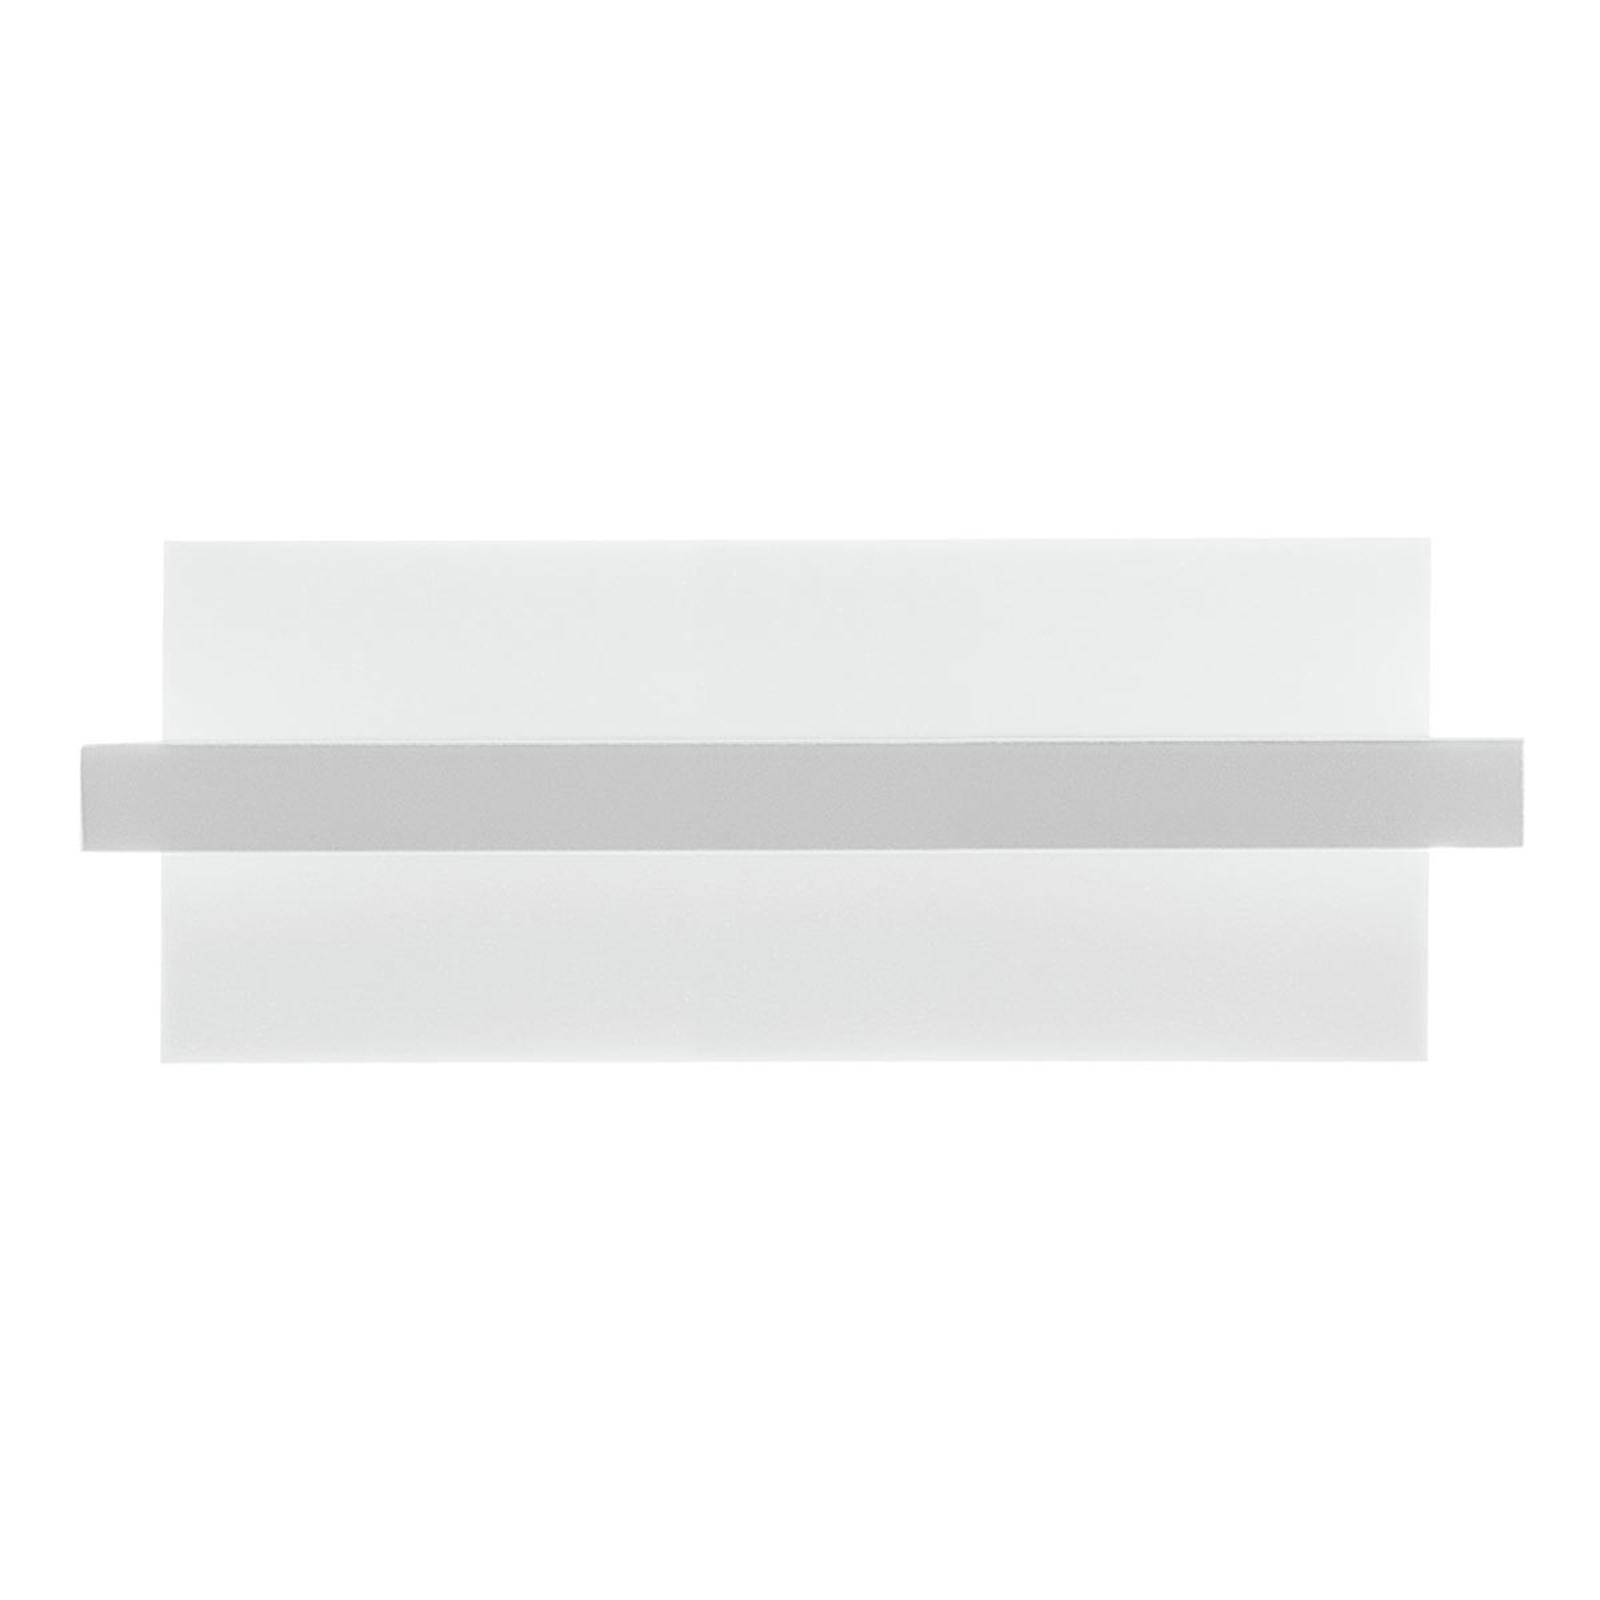 LED wandlamp tablet W1, breedte 24 cm, wit